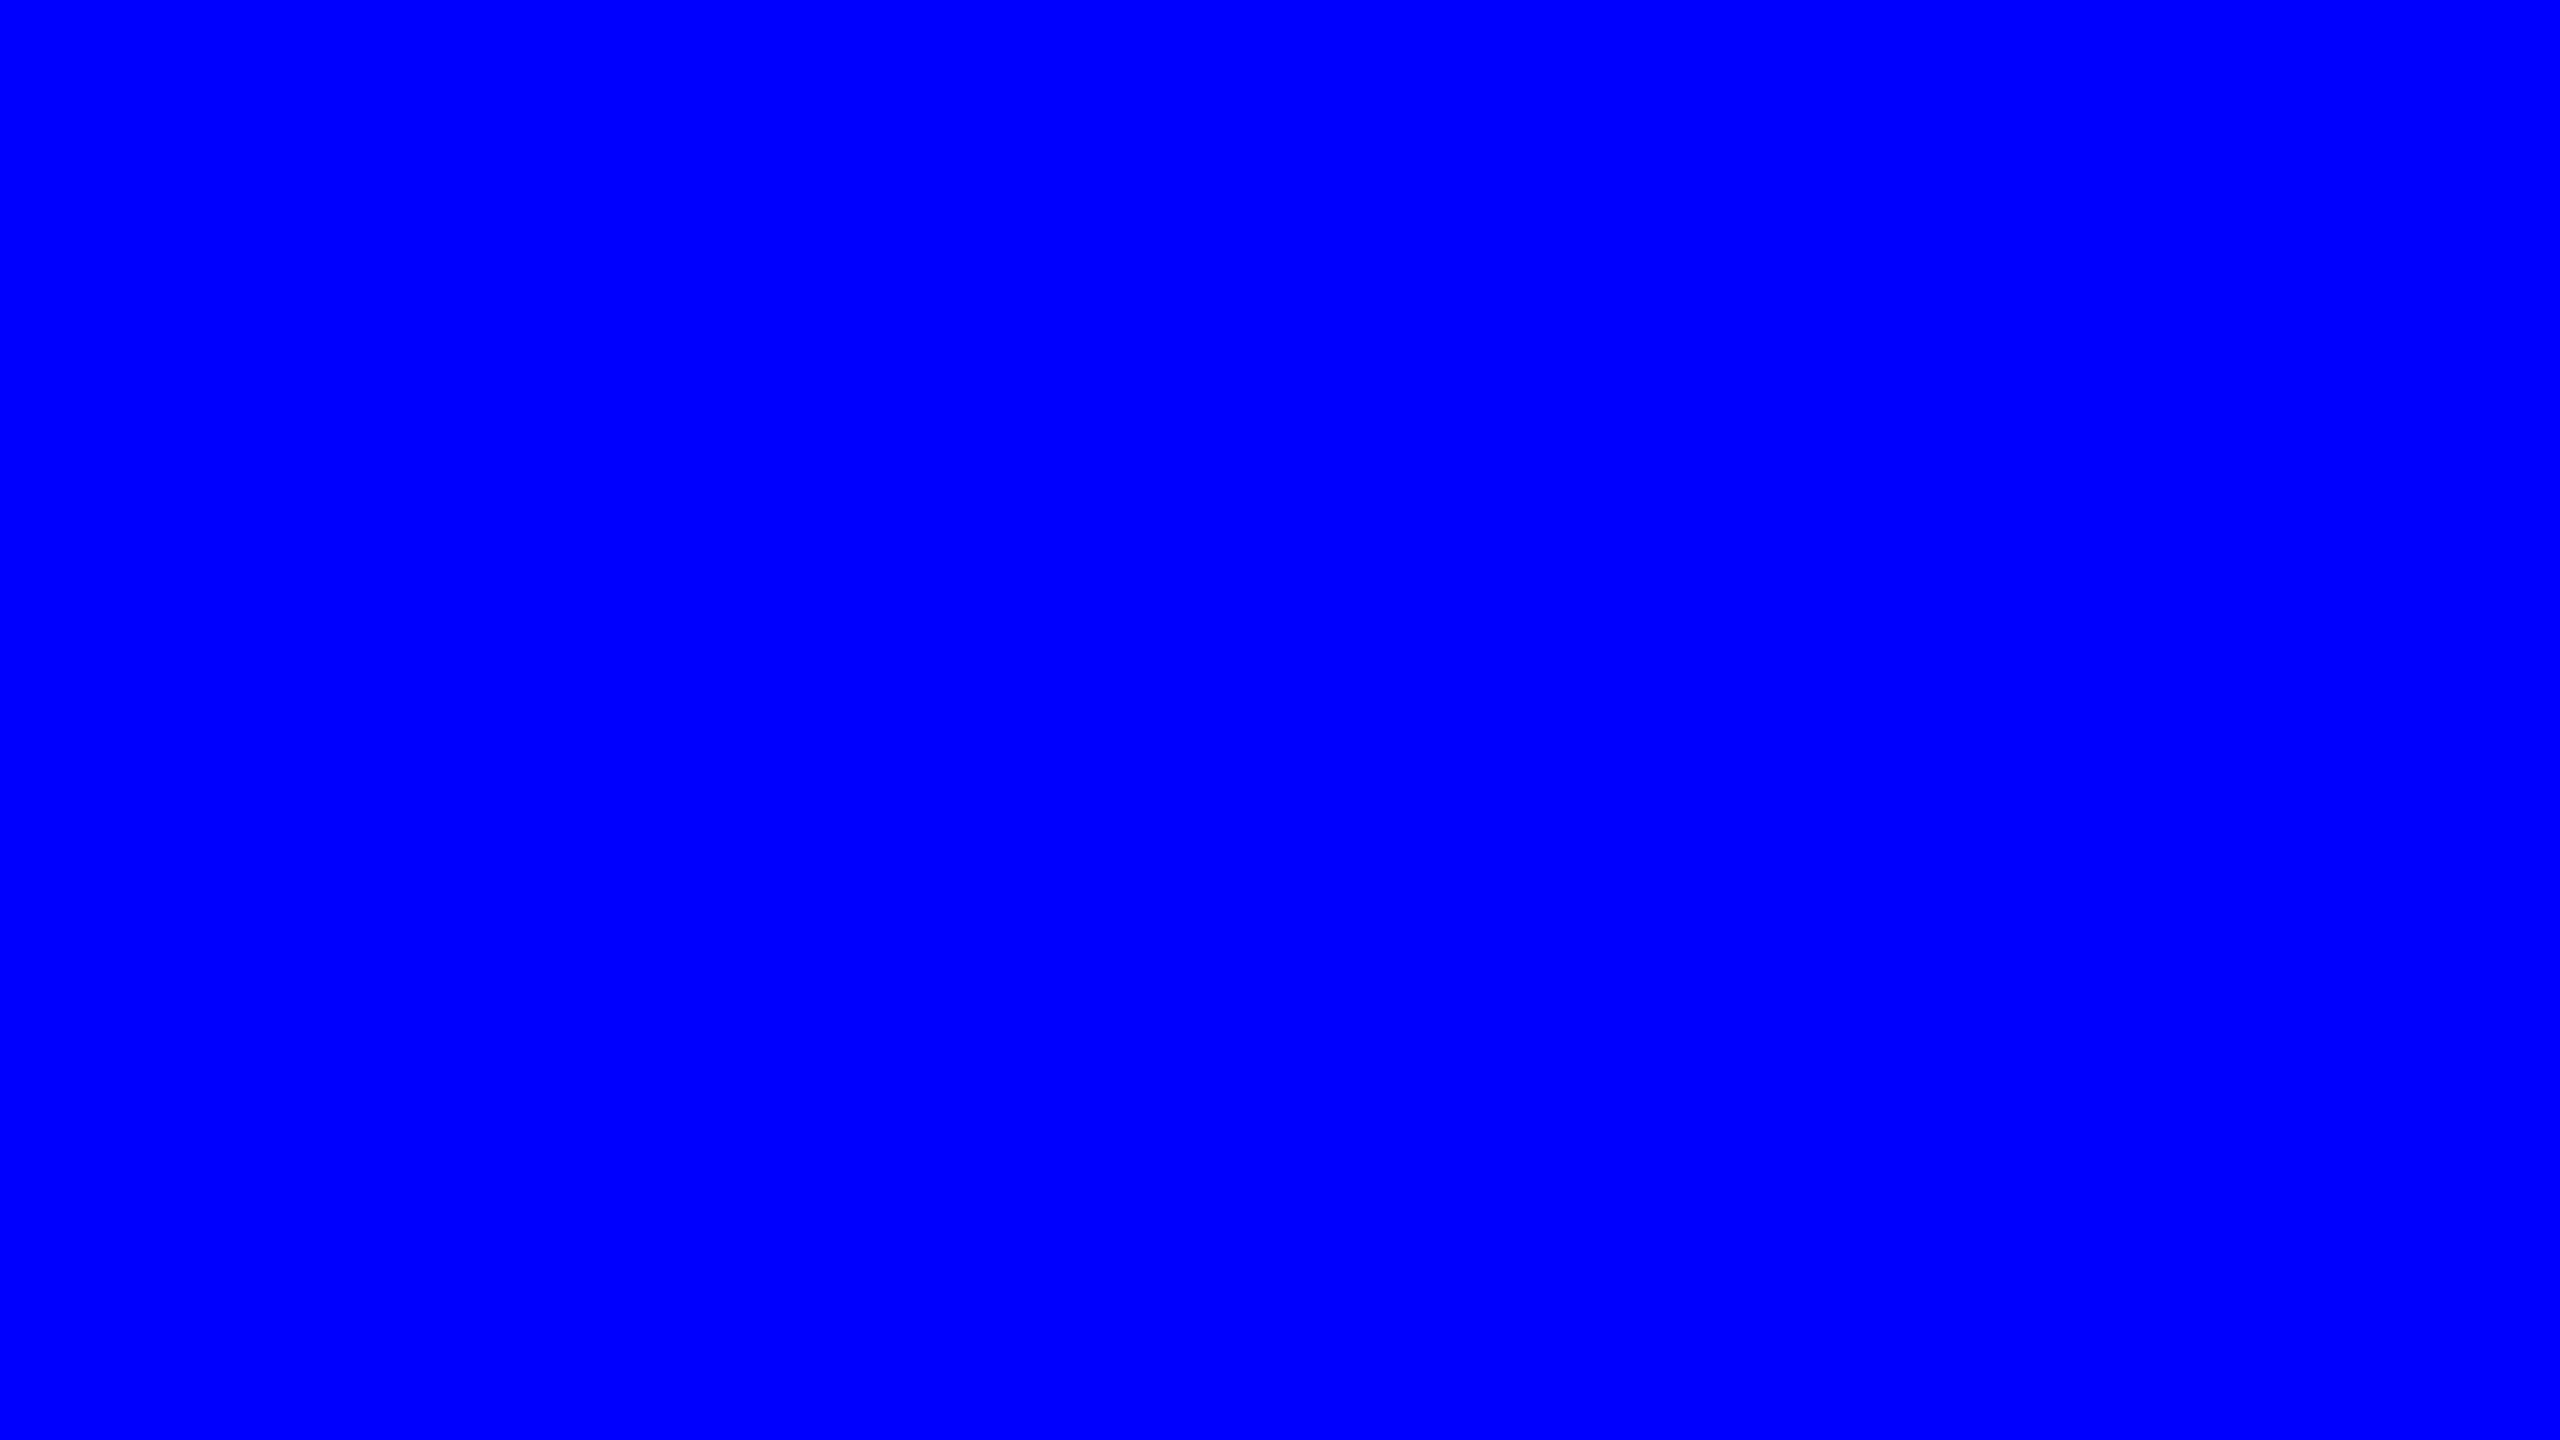 Solid Blue Background Wallpaper Wallpapersafari